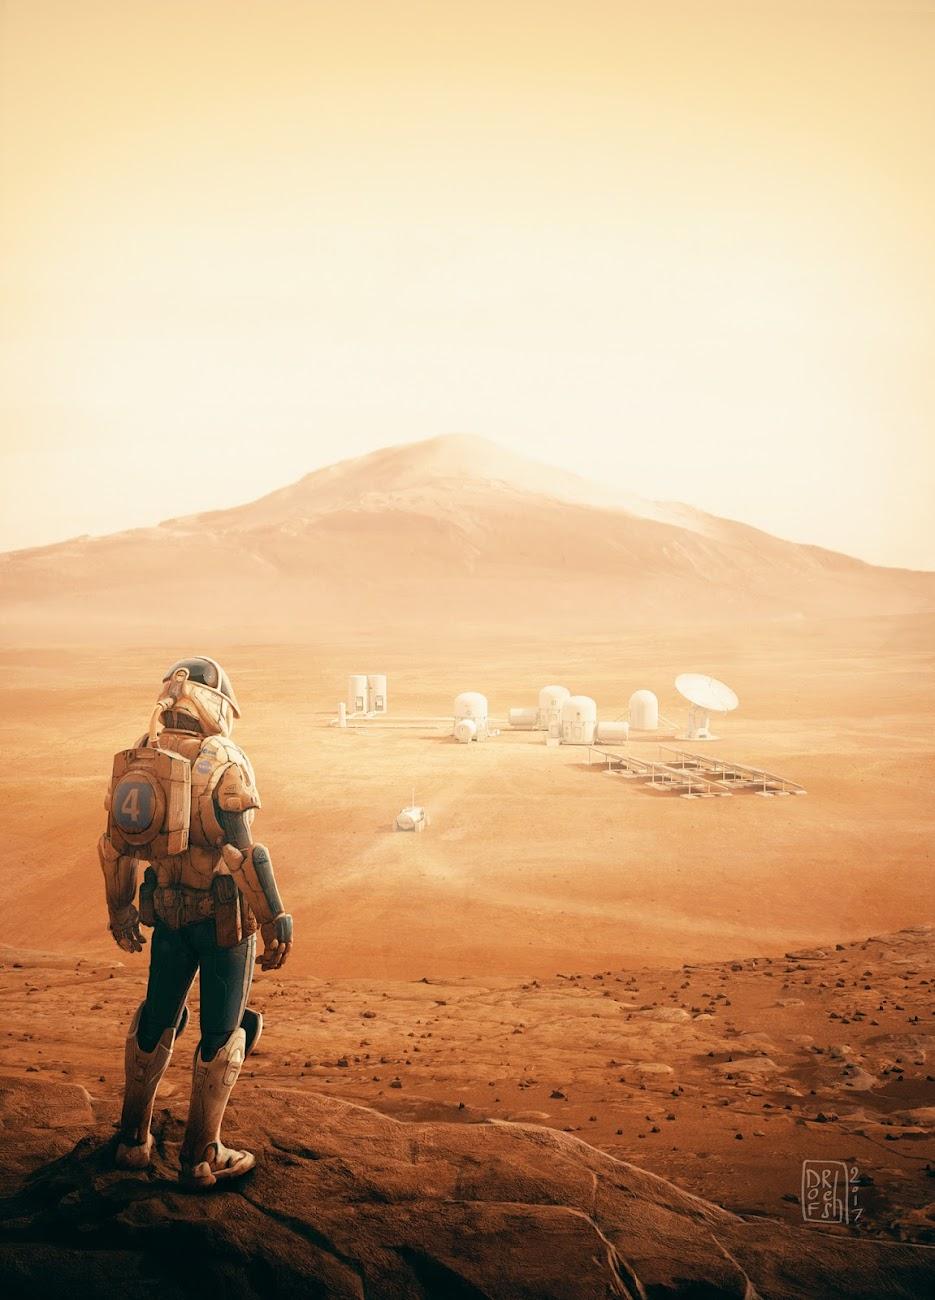 Early human base on Mars by Ronan Le Fur (Dofresh)